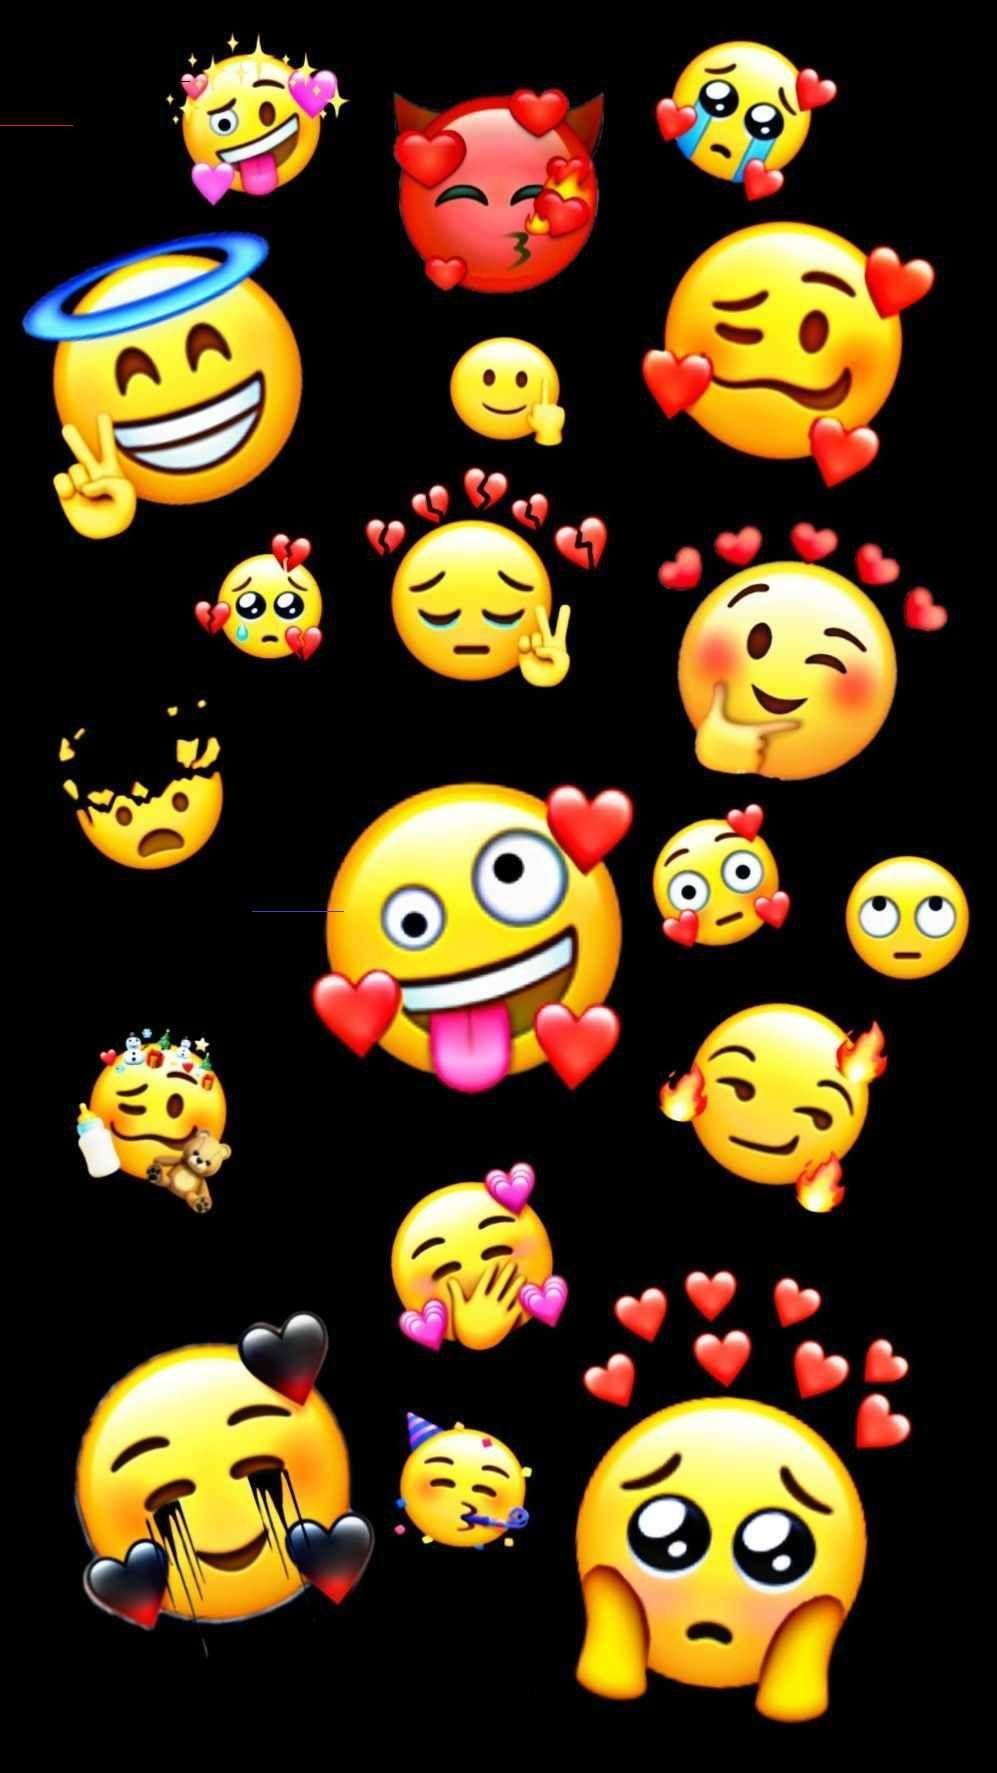 Ecran Fond D Ecran Fond D Ecran Telephone N De Funnywallpapers Cutelockscreenwallpaper In 2020 Cute Emoji Wallpaper Emoji Wallpaper Iphone Emoji Wallpaper